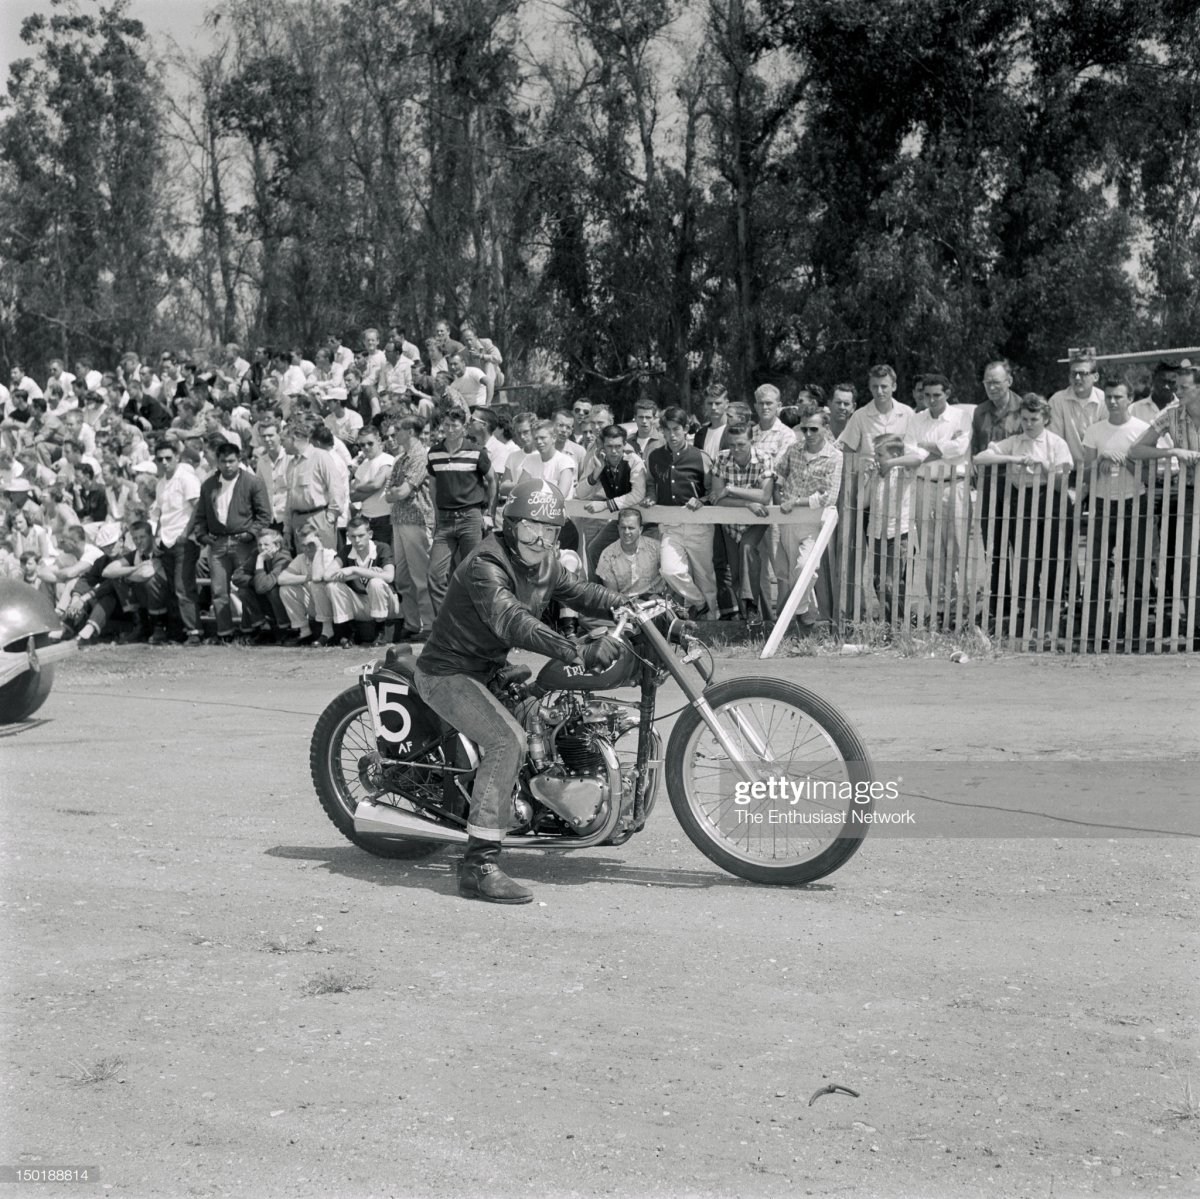 31 1955 NHRA Regional Championships - Colton California.jpg